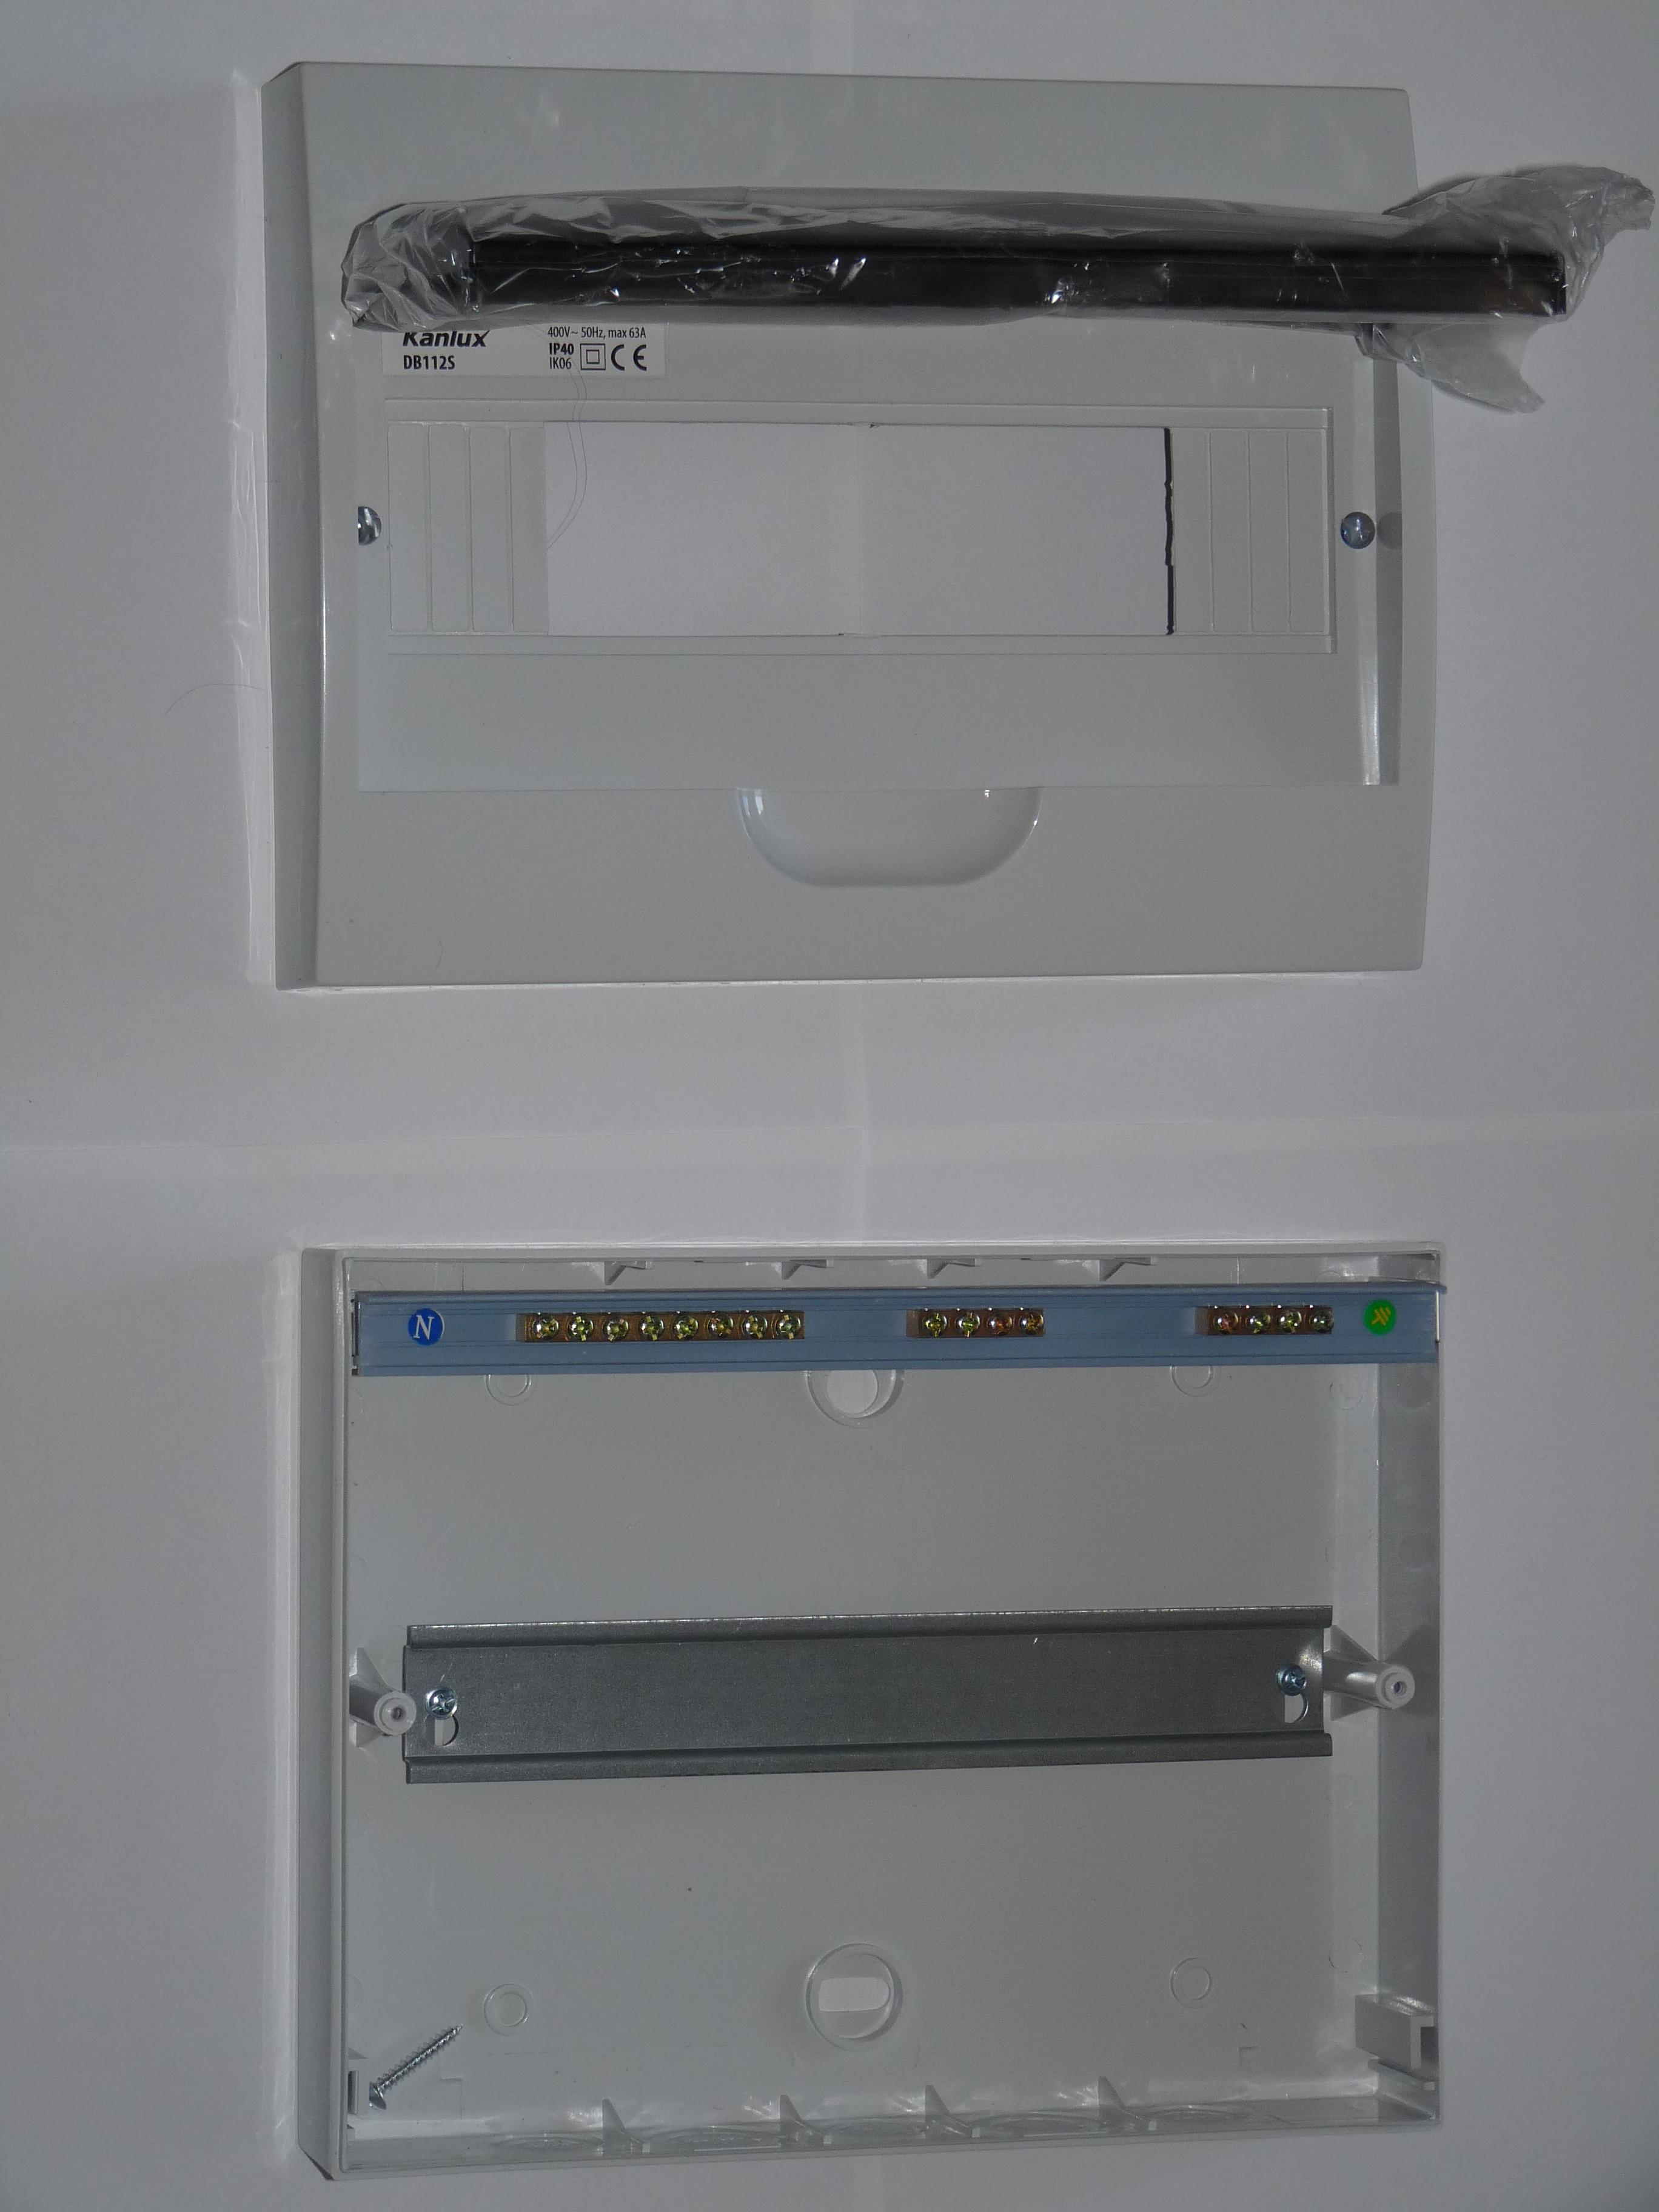 European Fuse Box Electrical Wiring Diagram St1300 File Inside Wikimedia Commons Vollschutz